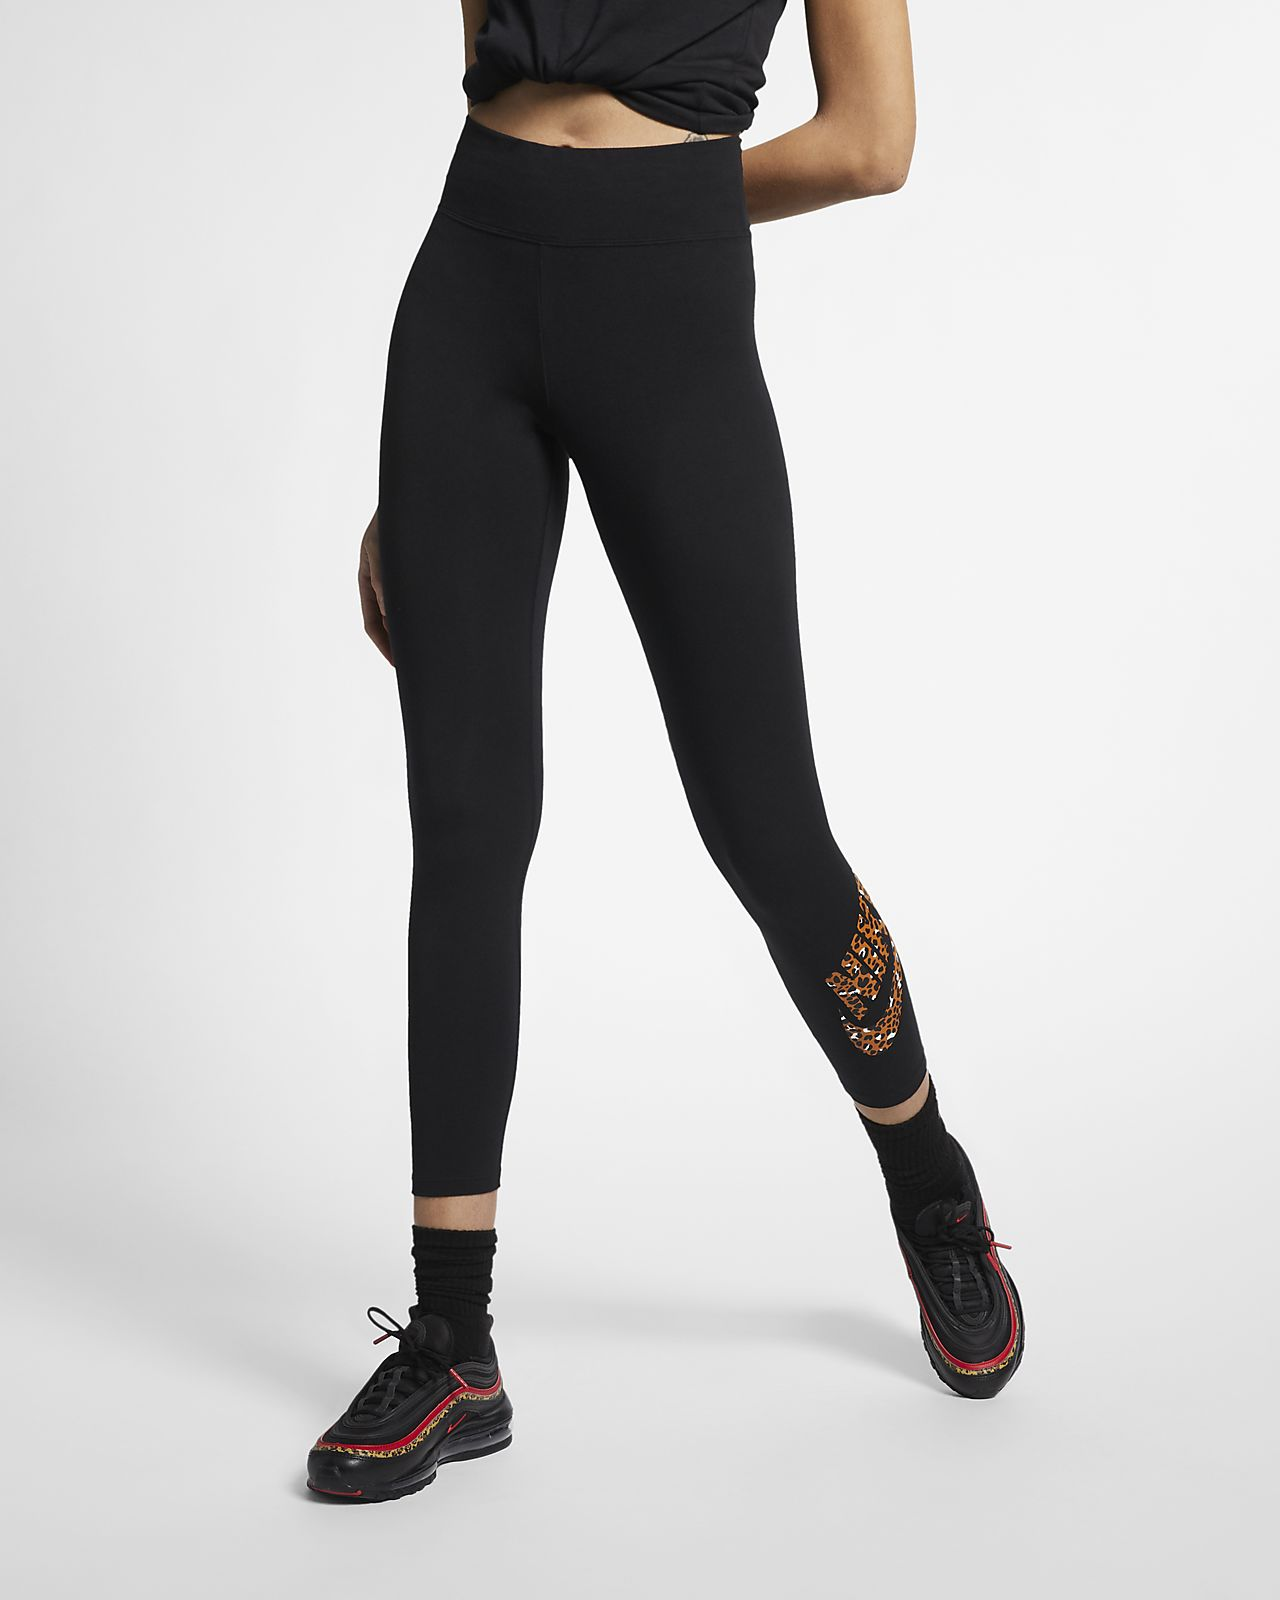 Nike Sportswear Animal Print Leggings - Dona